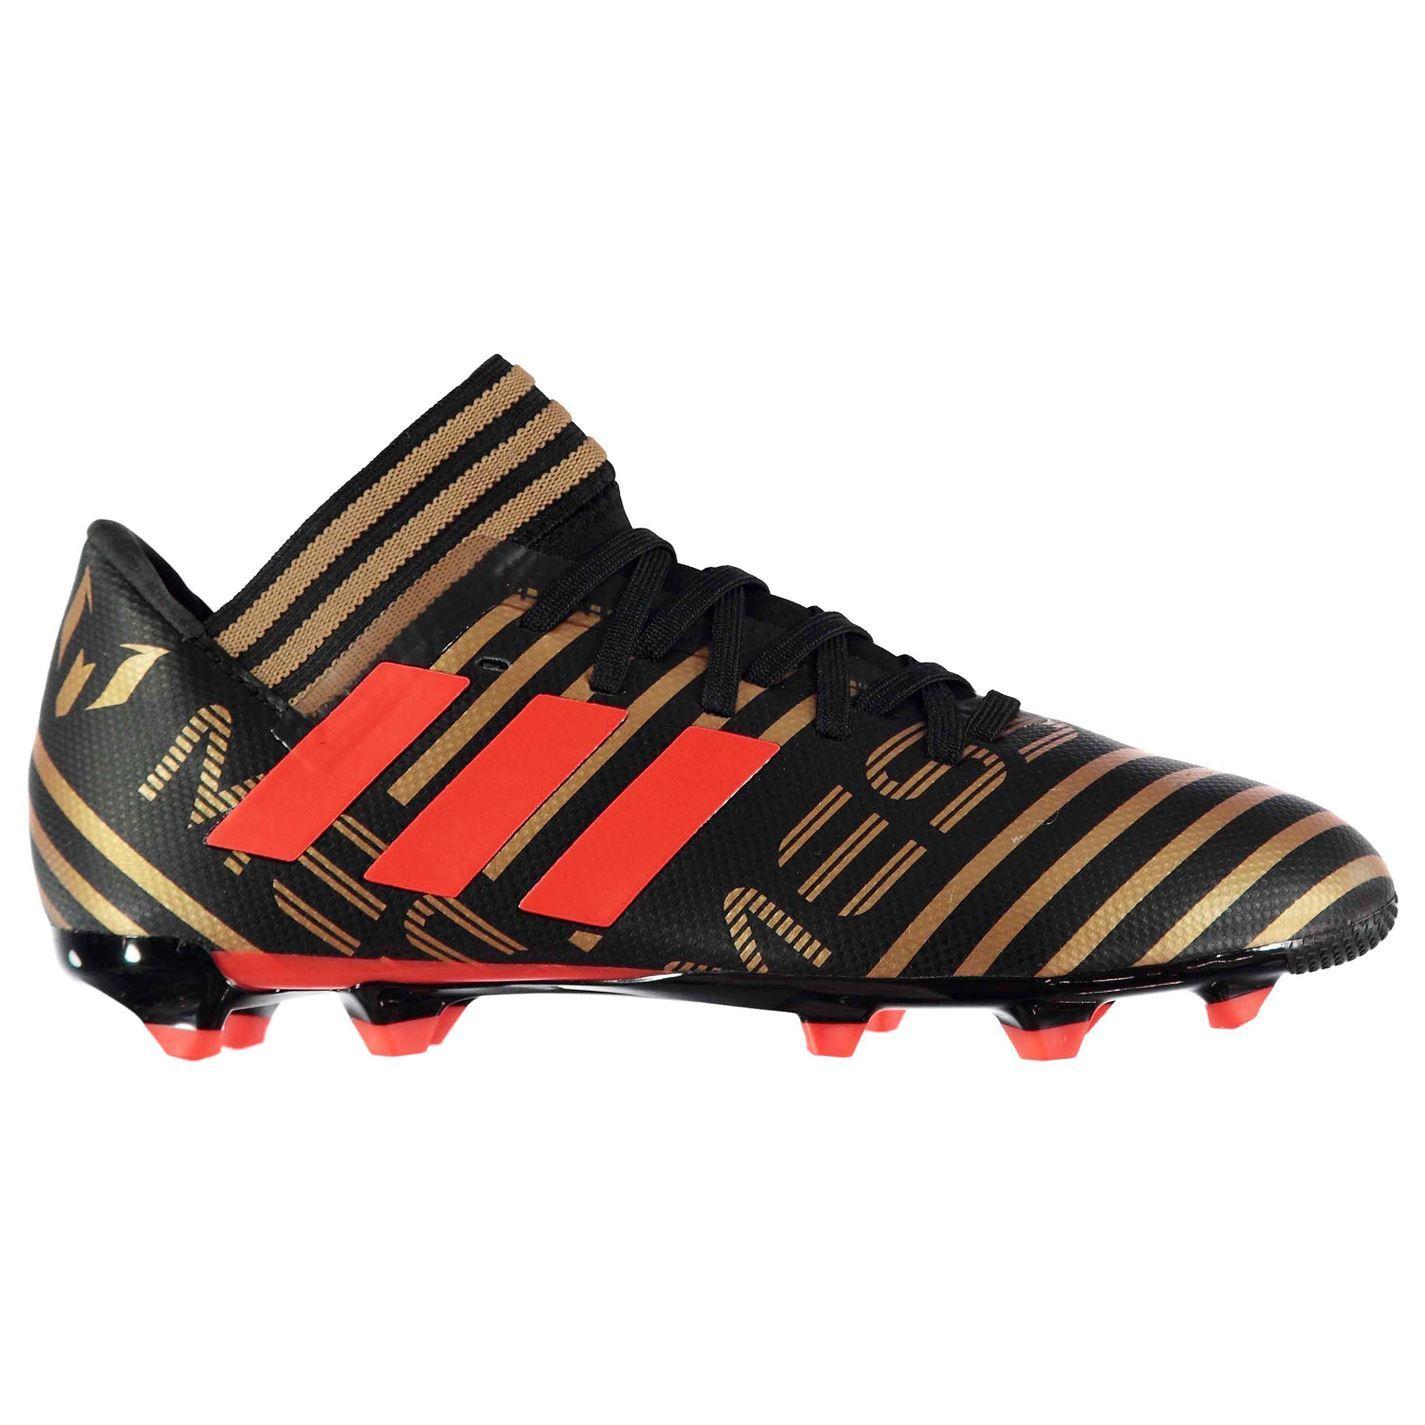 quality design 166cd d122e ... Adidas Nemeziz Messi 1 7.3 Firm Ground Football bottes Juniors noir  Soccer crampons ...